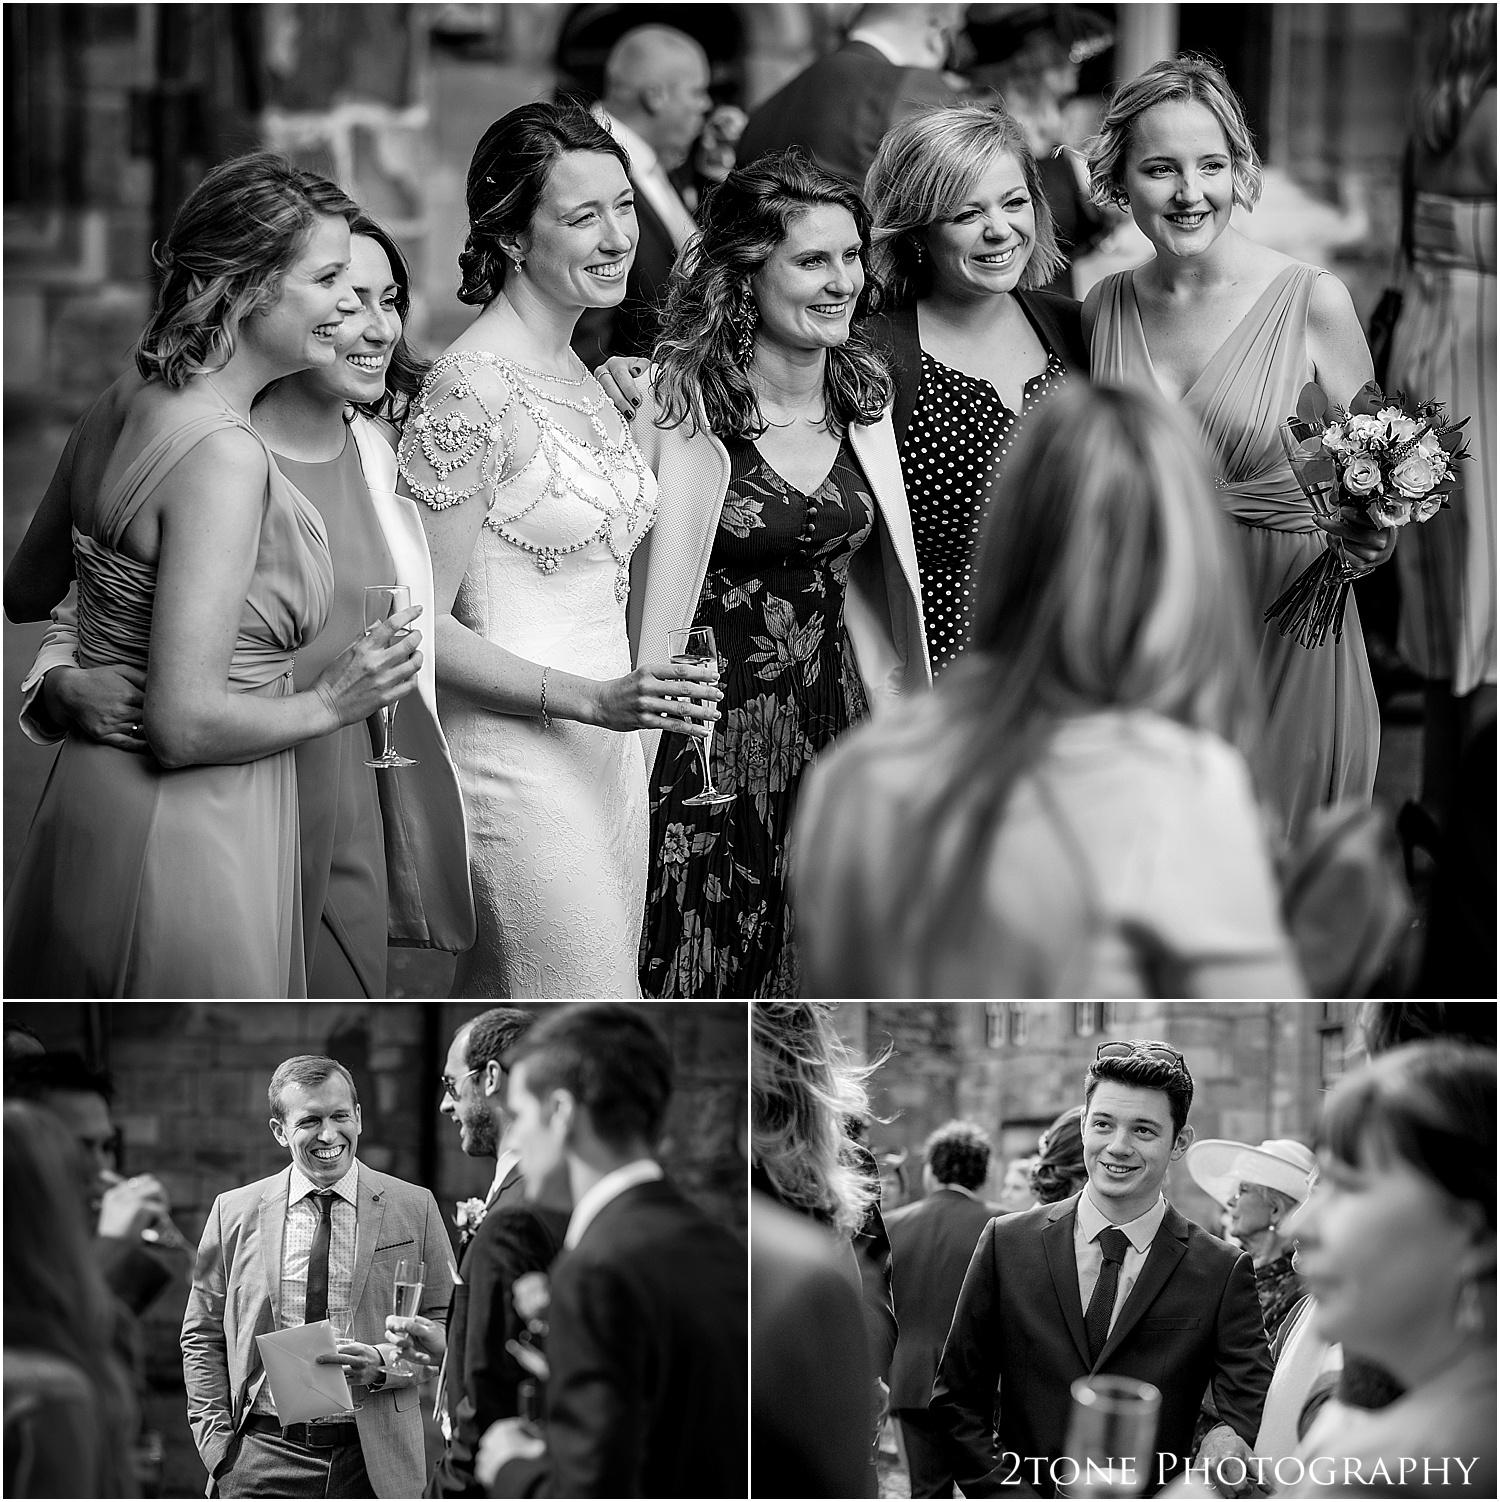 Durham-Castle-wedding-Laura-James 058.jpg